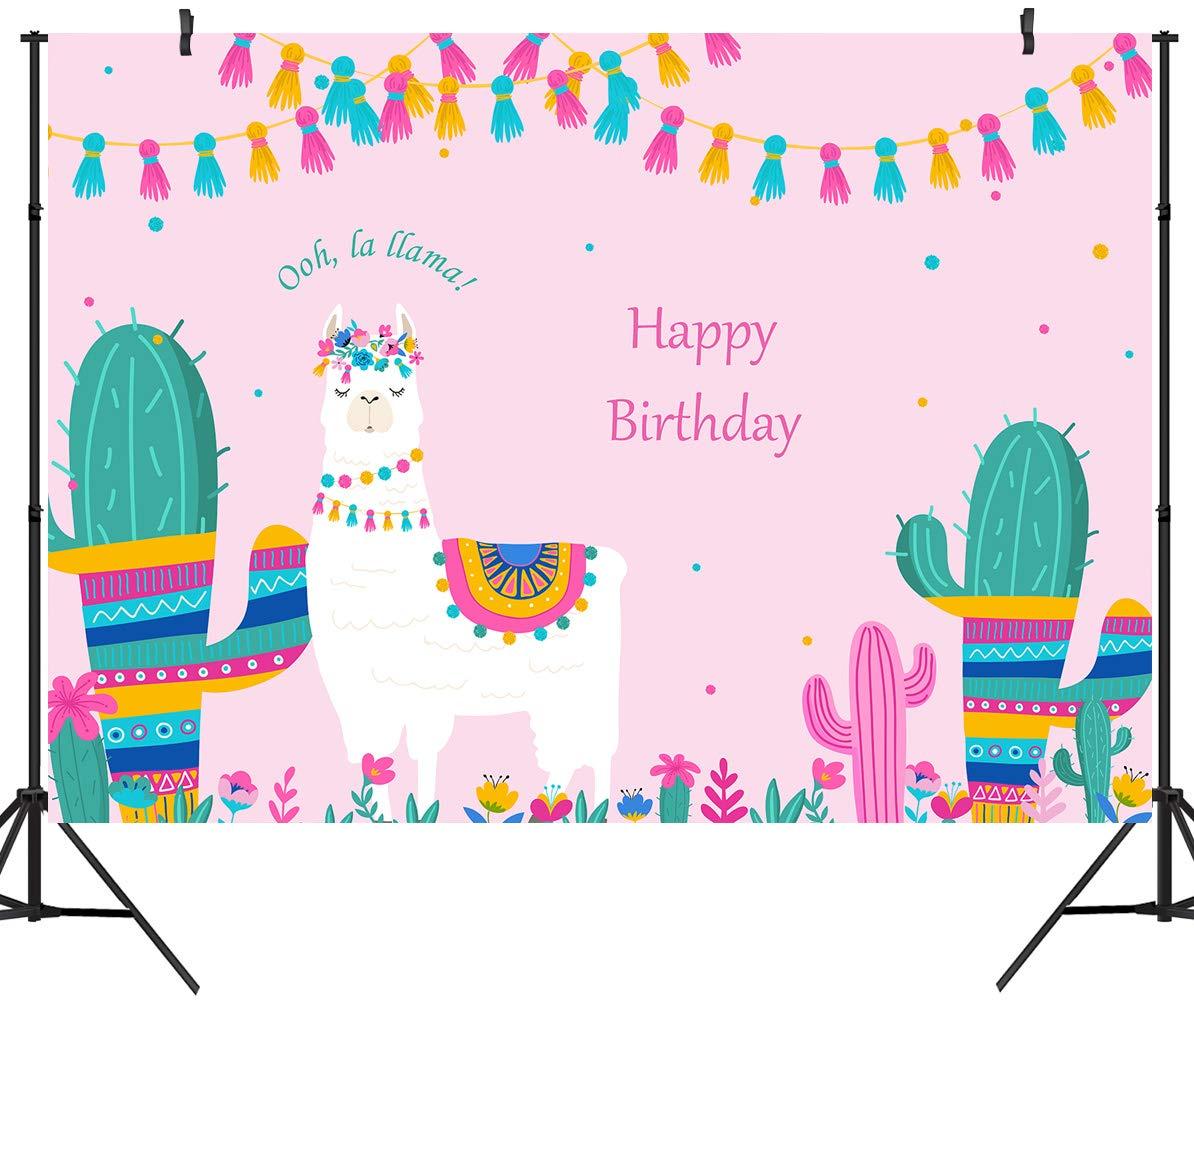 DULUDA 5X3FT oh La Llama Backdrop Happy Birthday Llama Fun Photography Background Vinyl Pink Alpaca Baby Shower Party Banner Decoration Photo Booth Prop AP03F